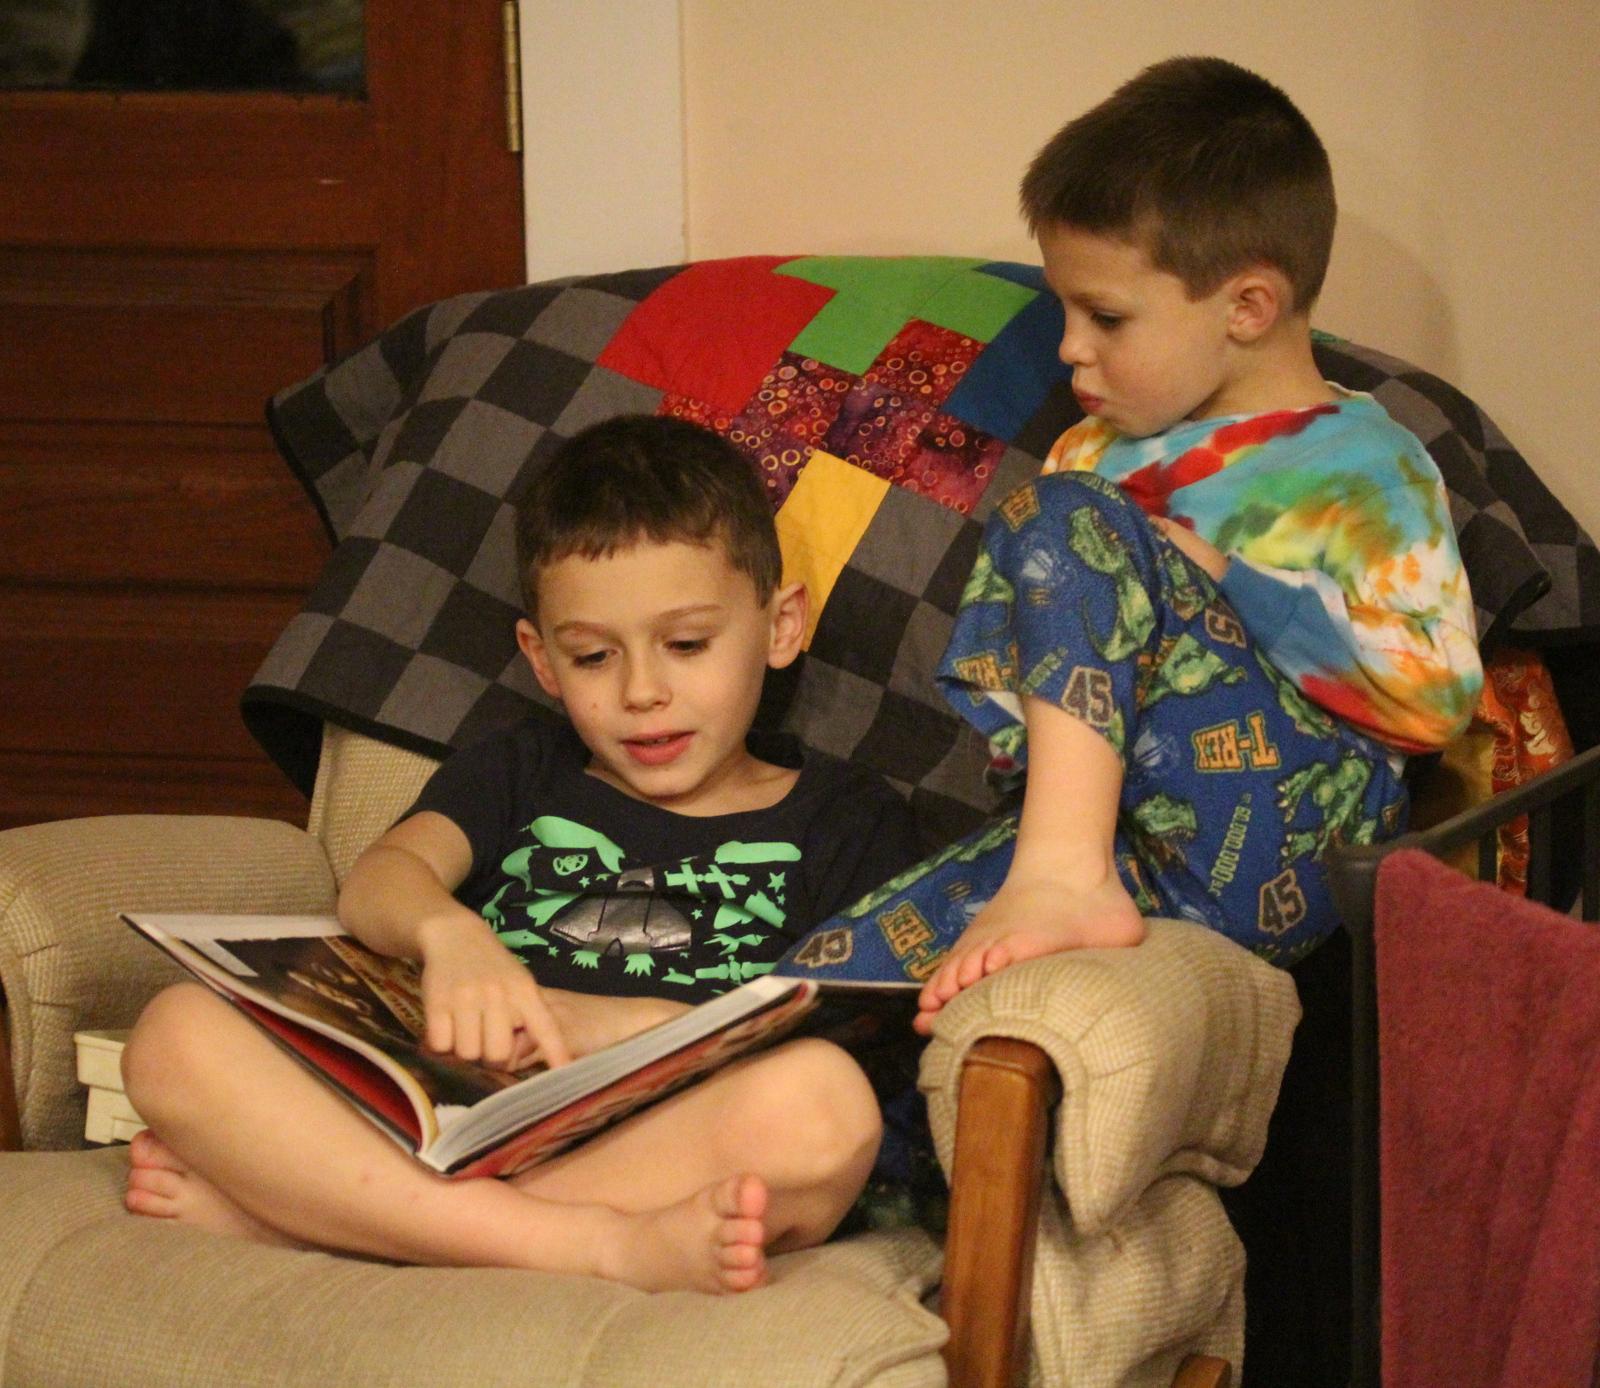 Denton, George, armchair, book